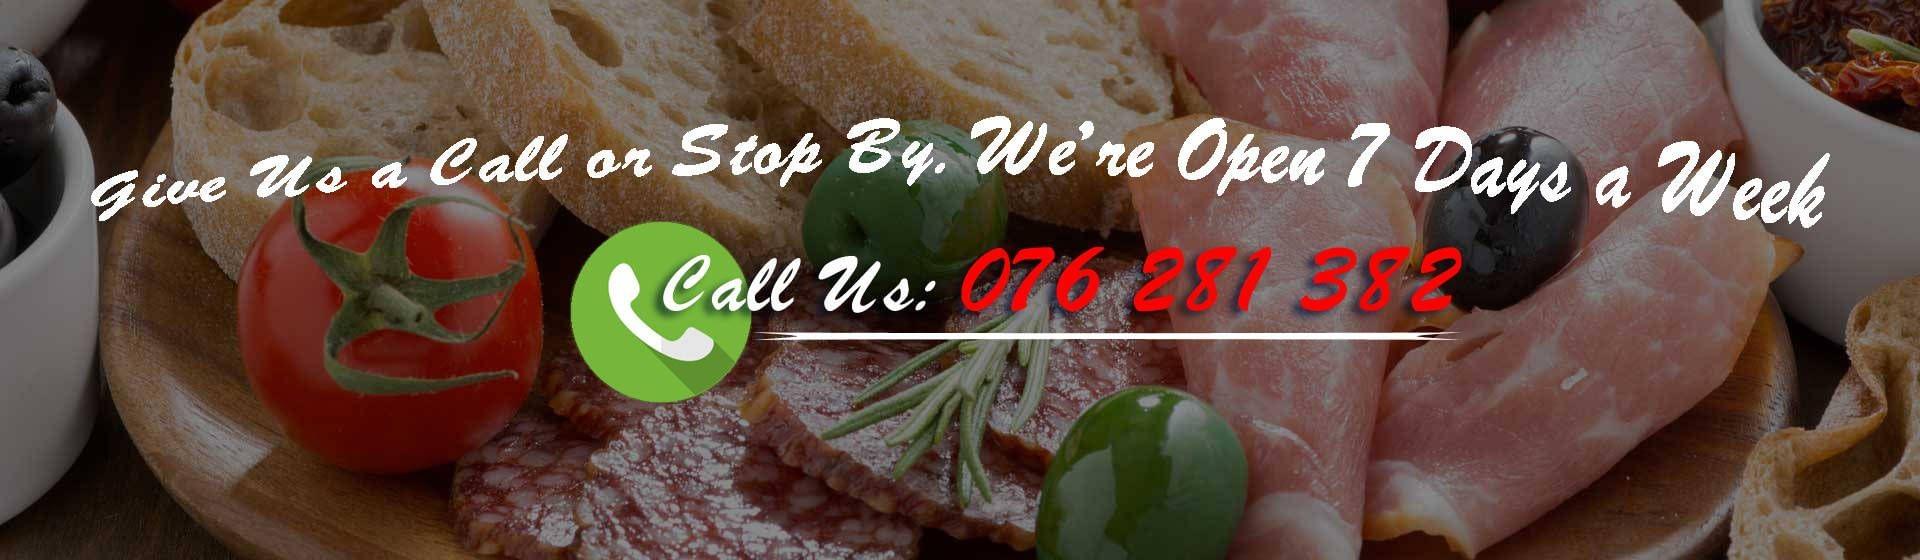 Phuket Food Delivery - Trattoria Pizzeria Cosa Nostra